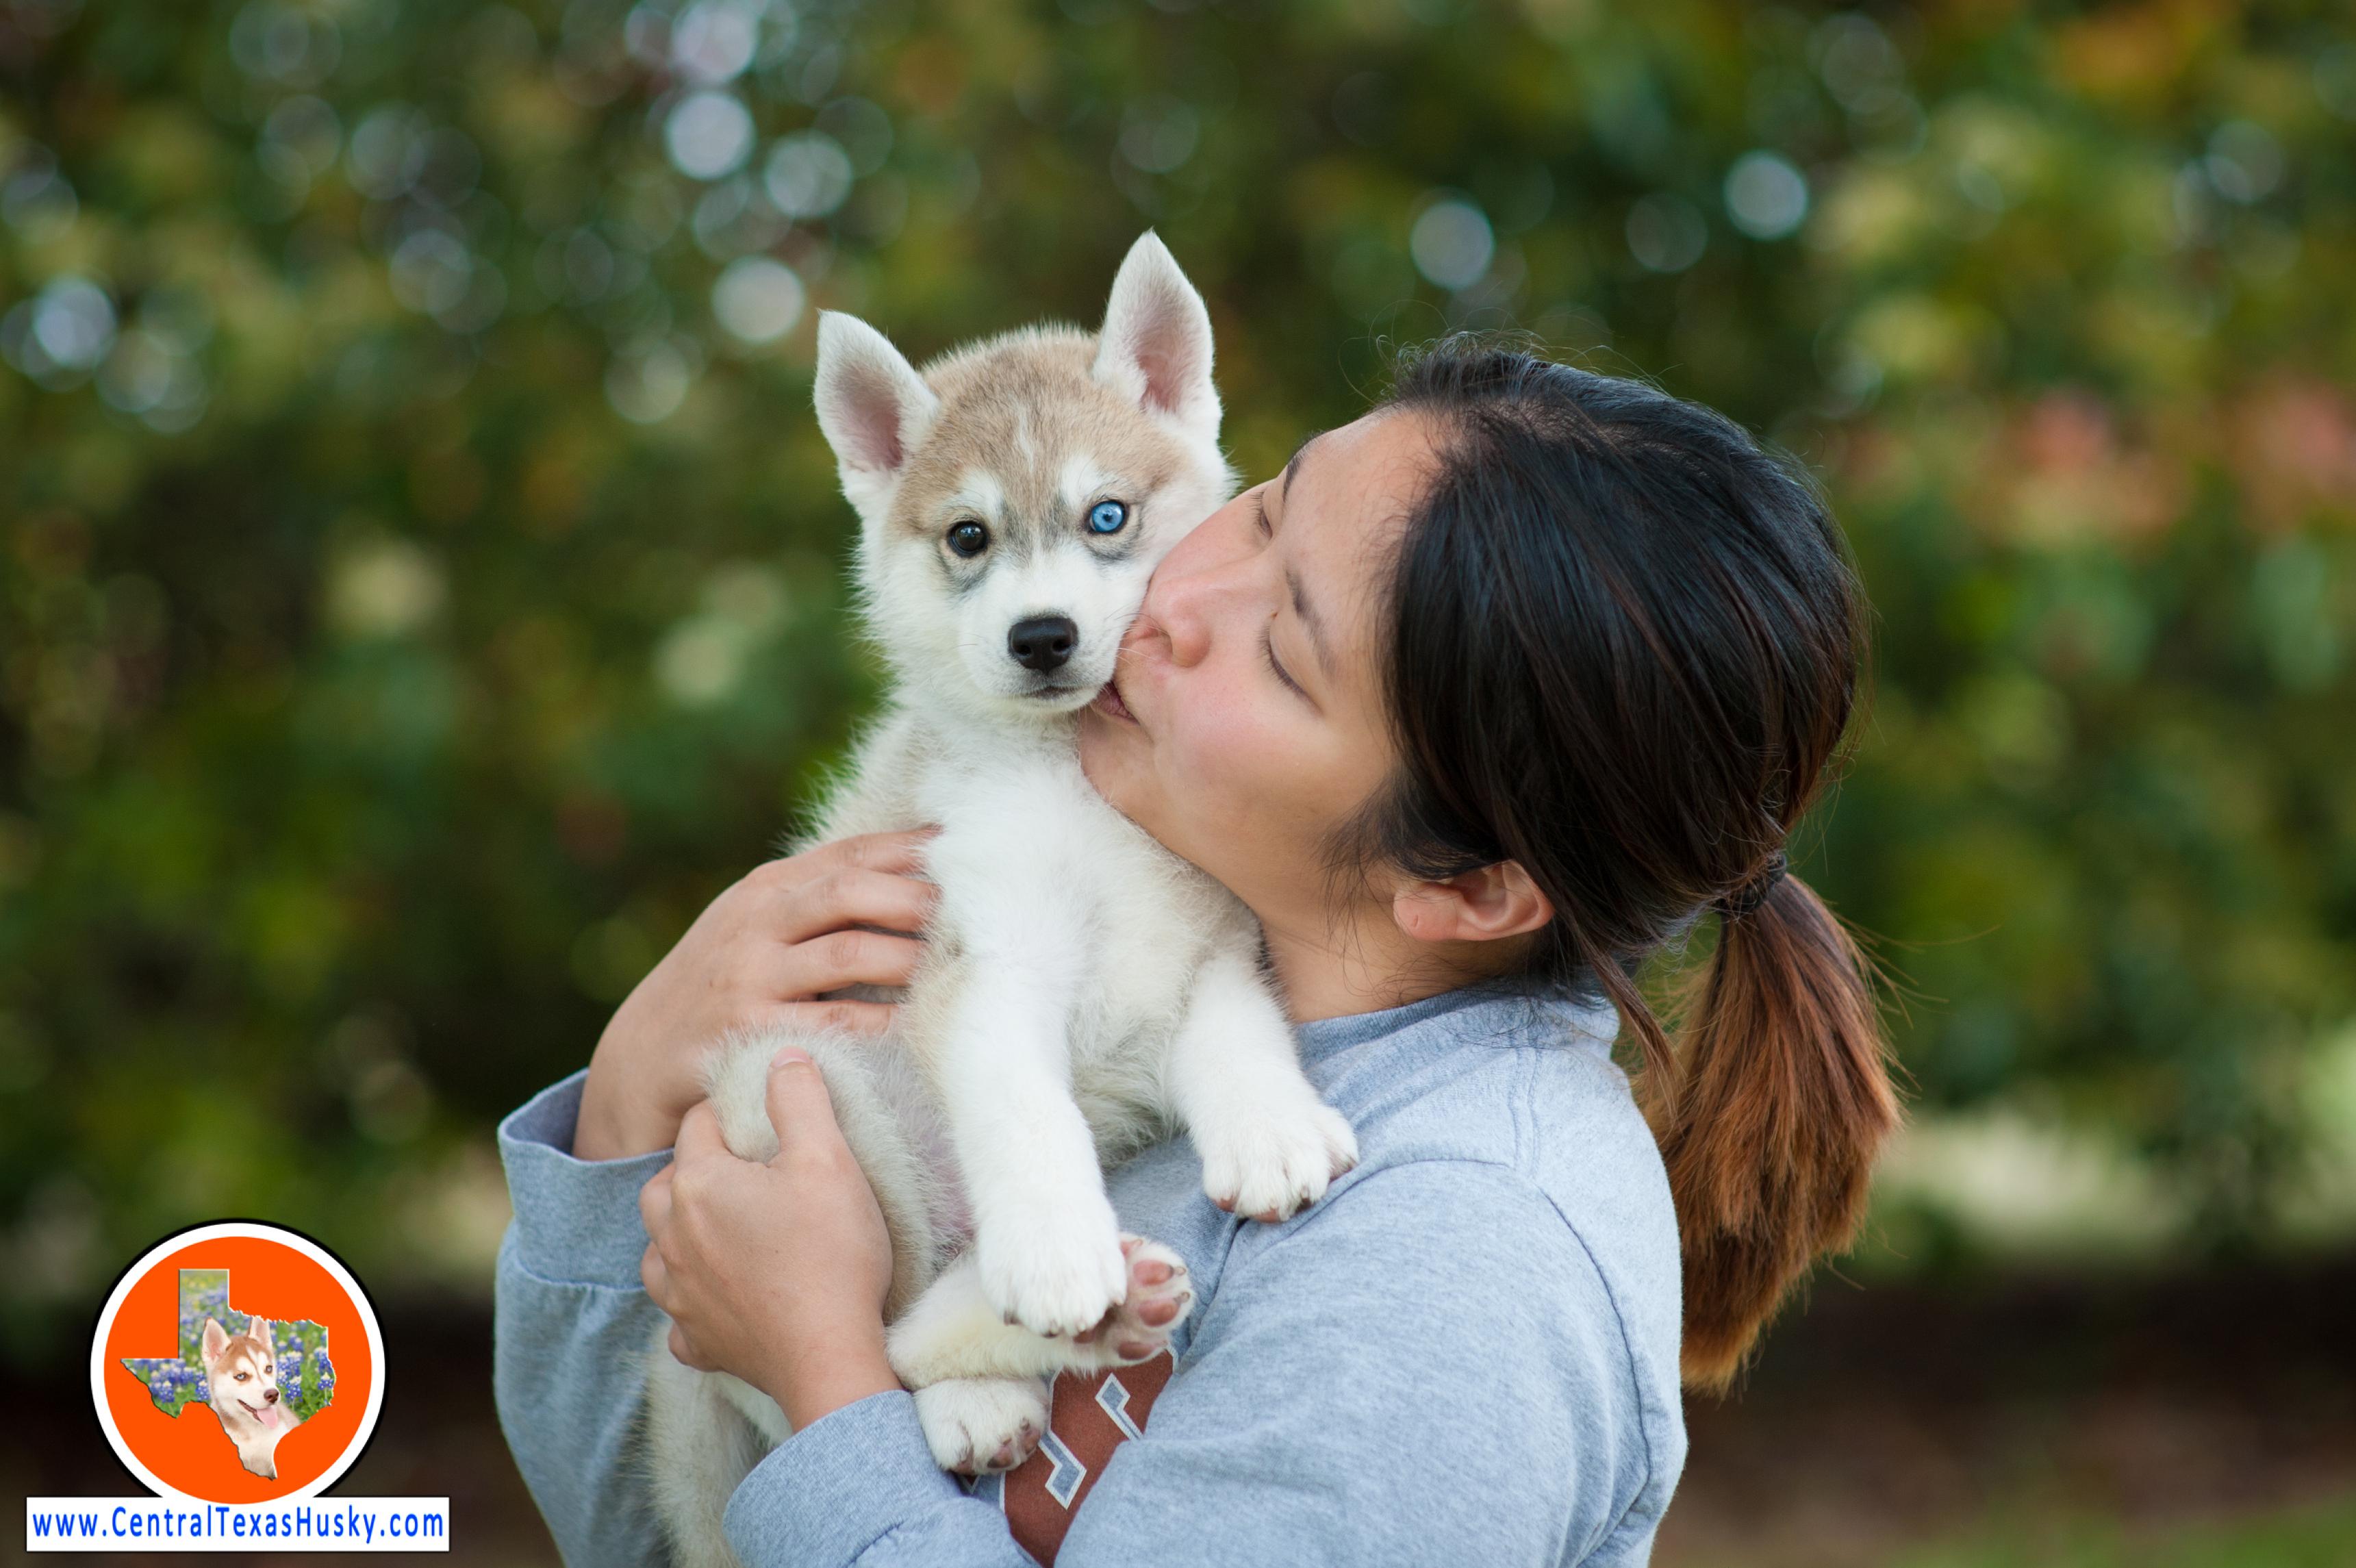 central-texas-husky_austin-siberian-husky-breeder_704419_20180408